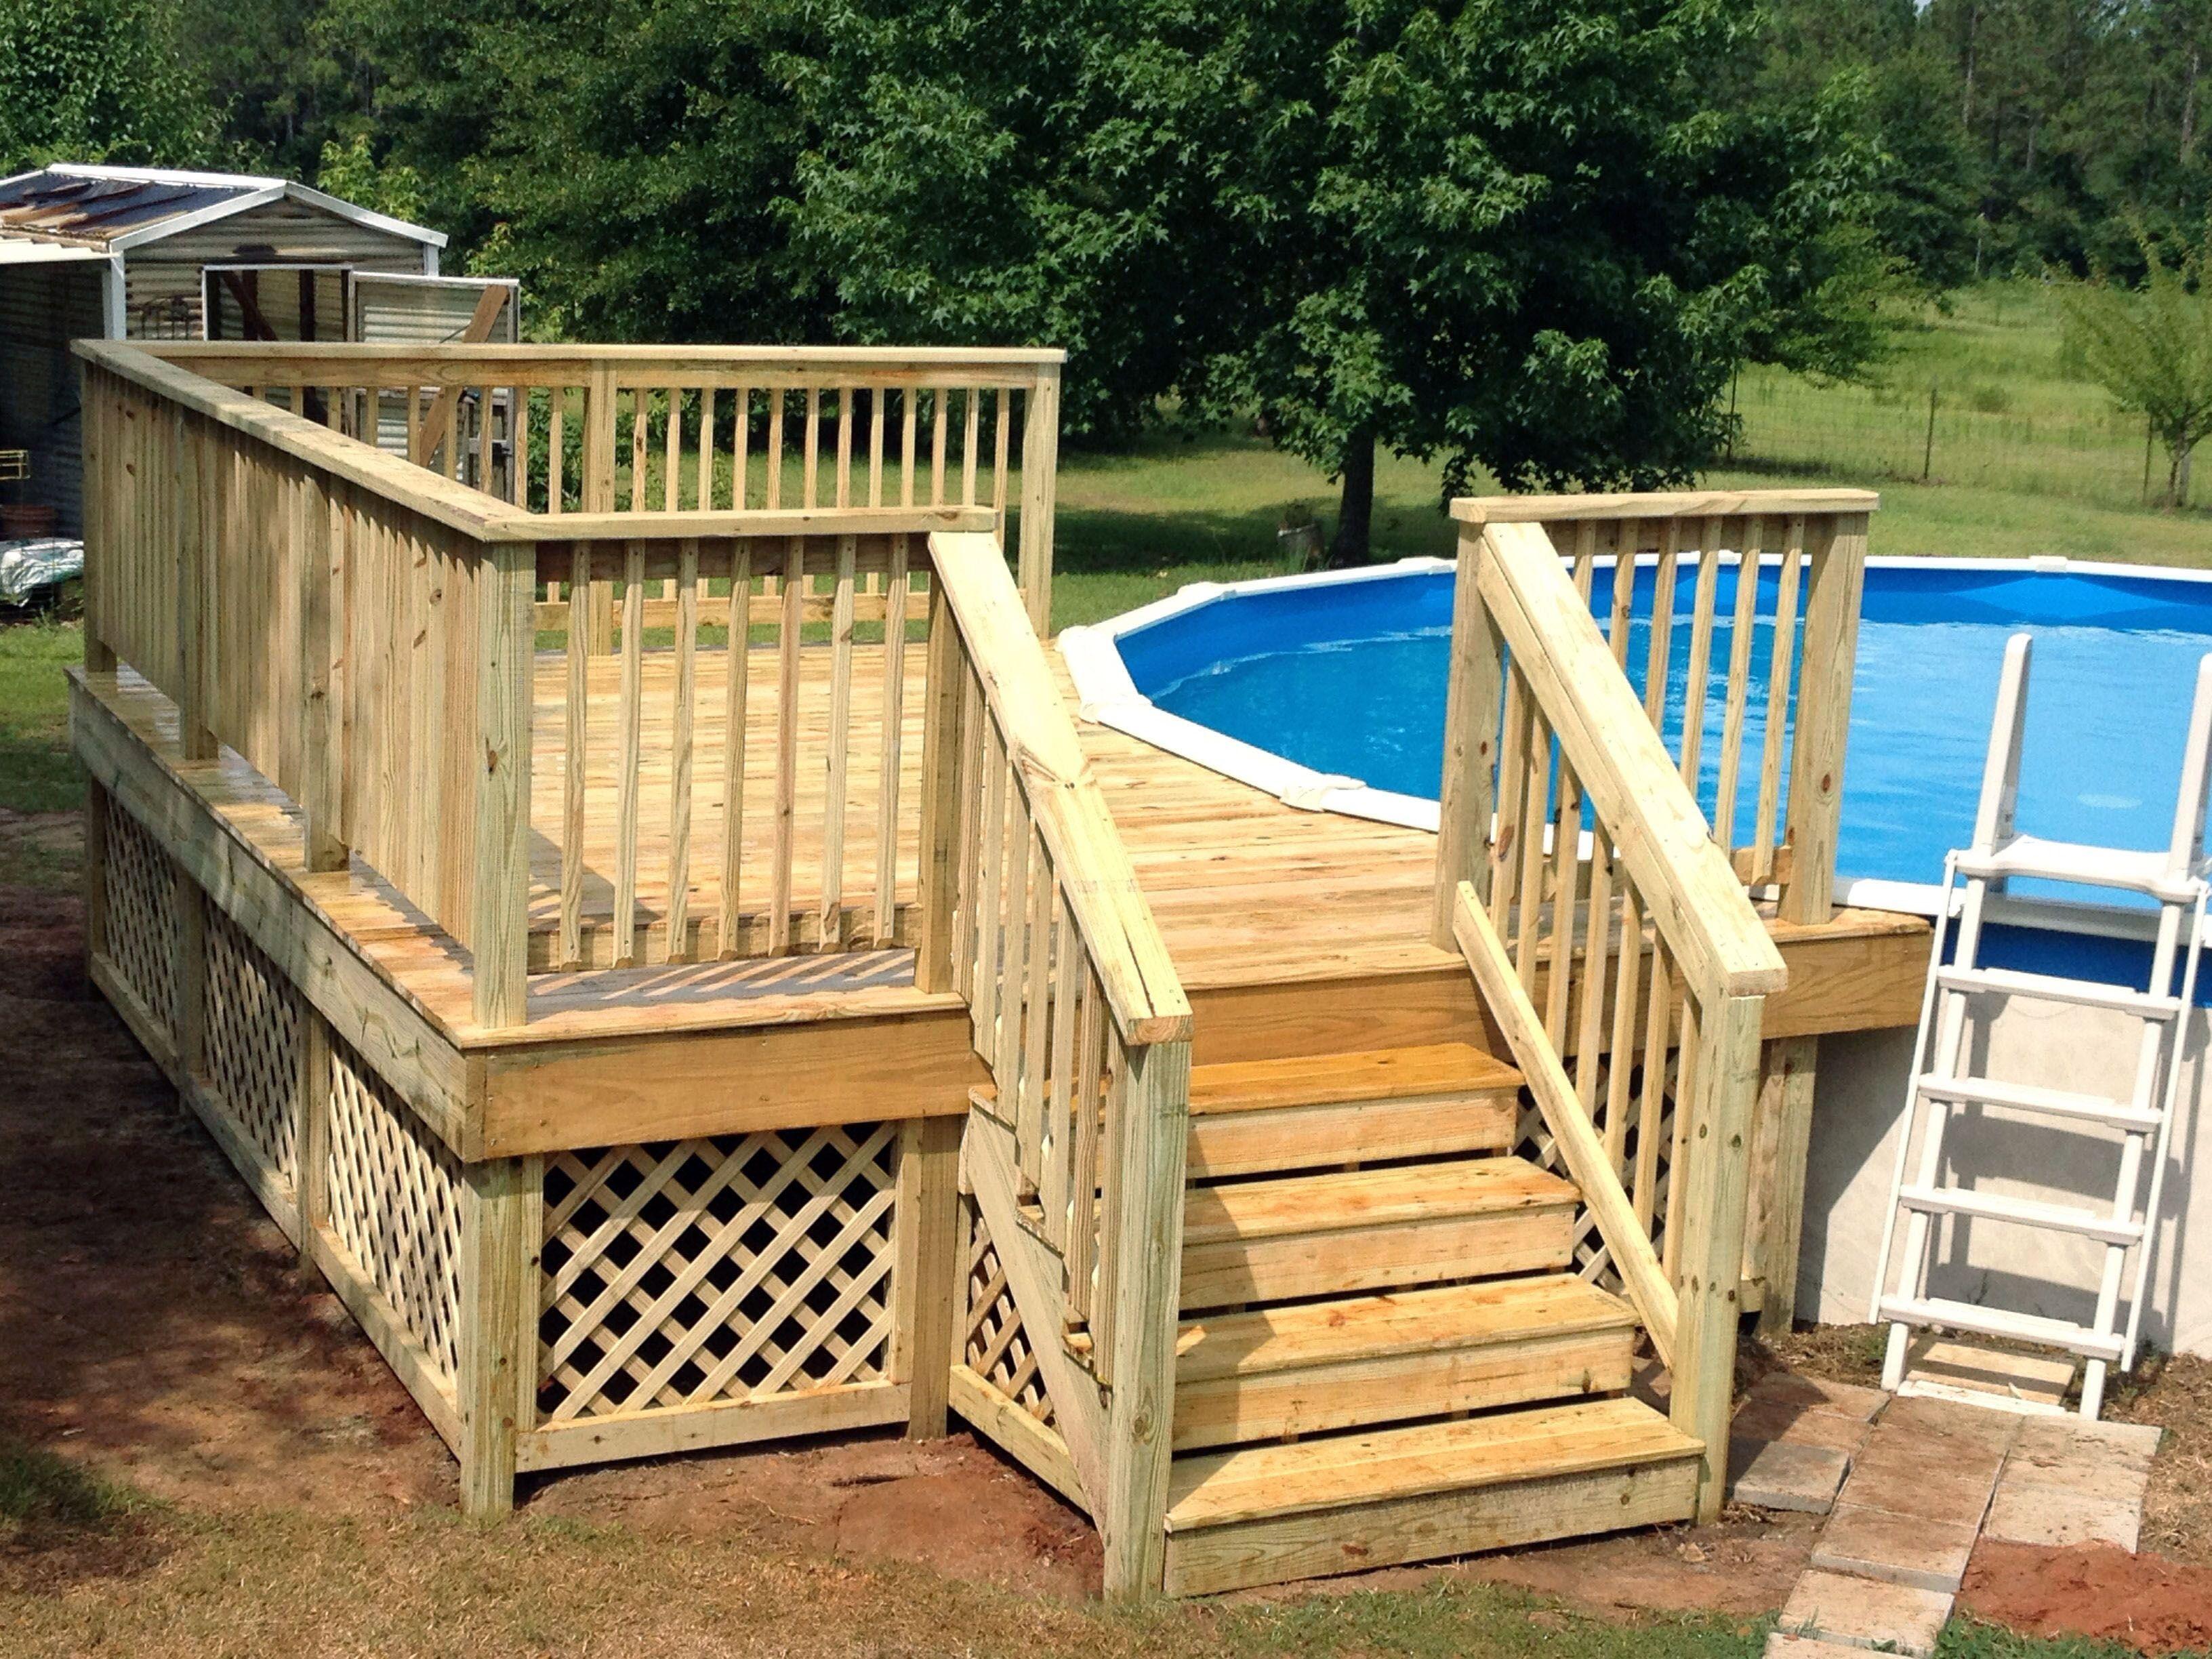 Pool Deck Ideas Best Above Ground Pool Above Ground Pool Decks